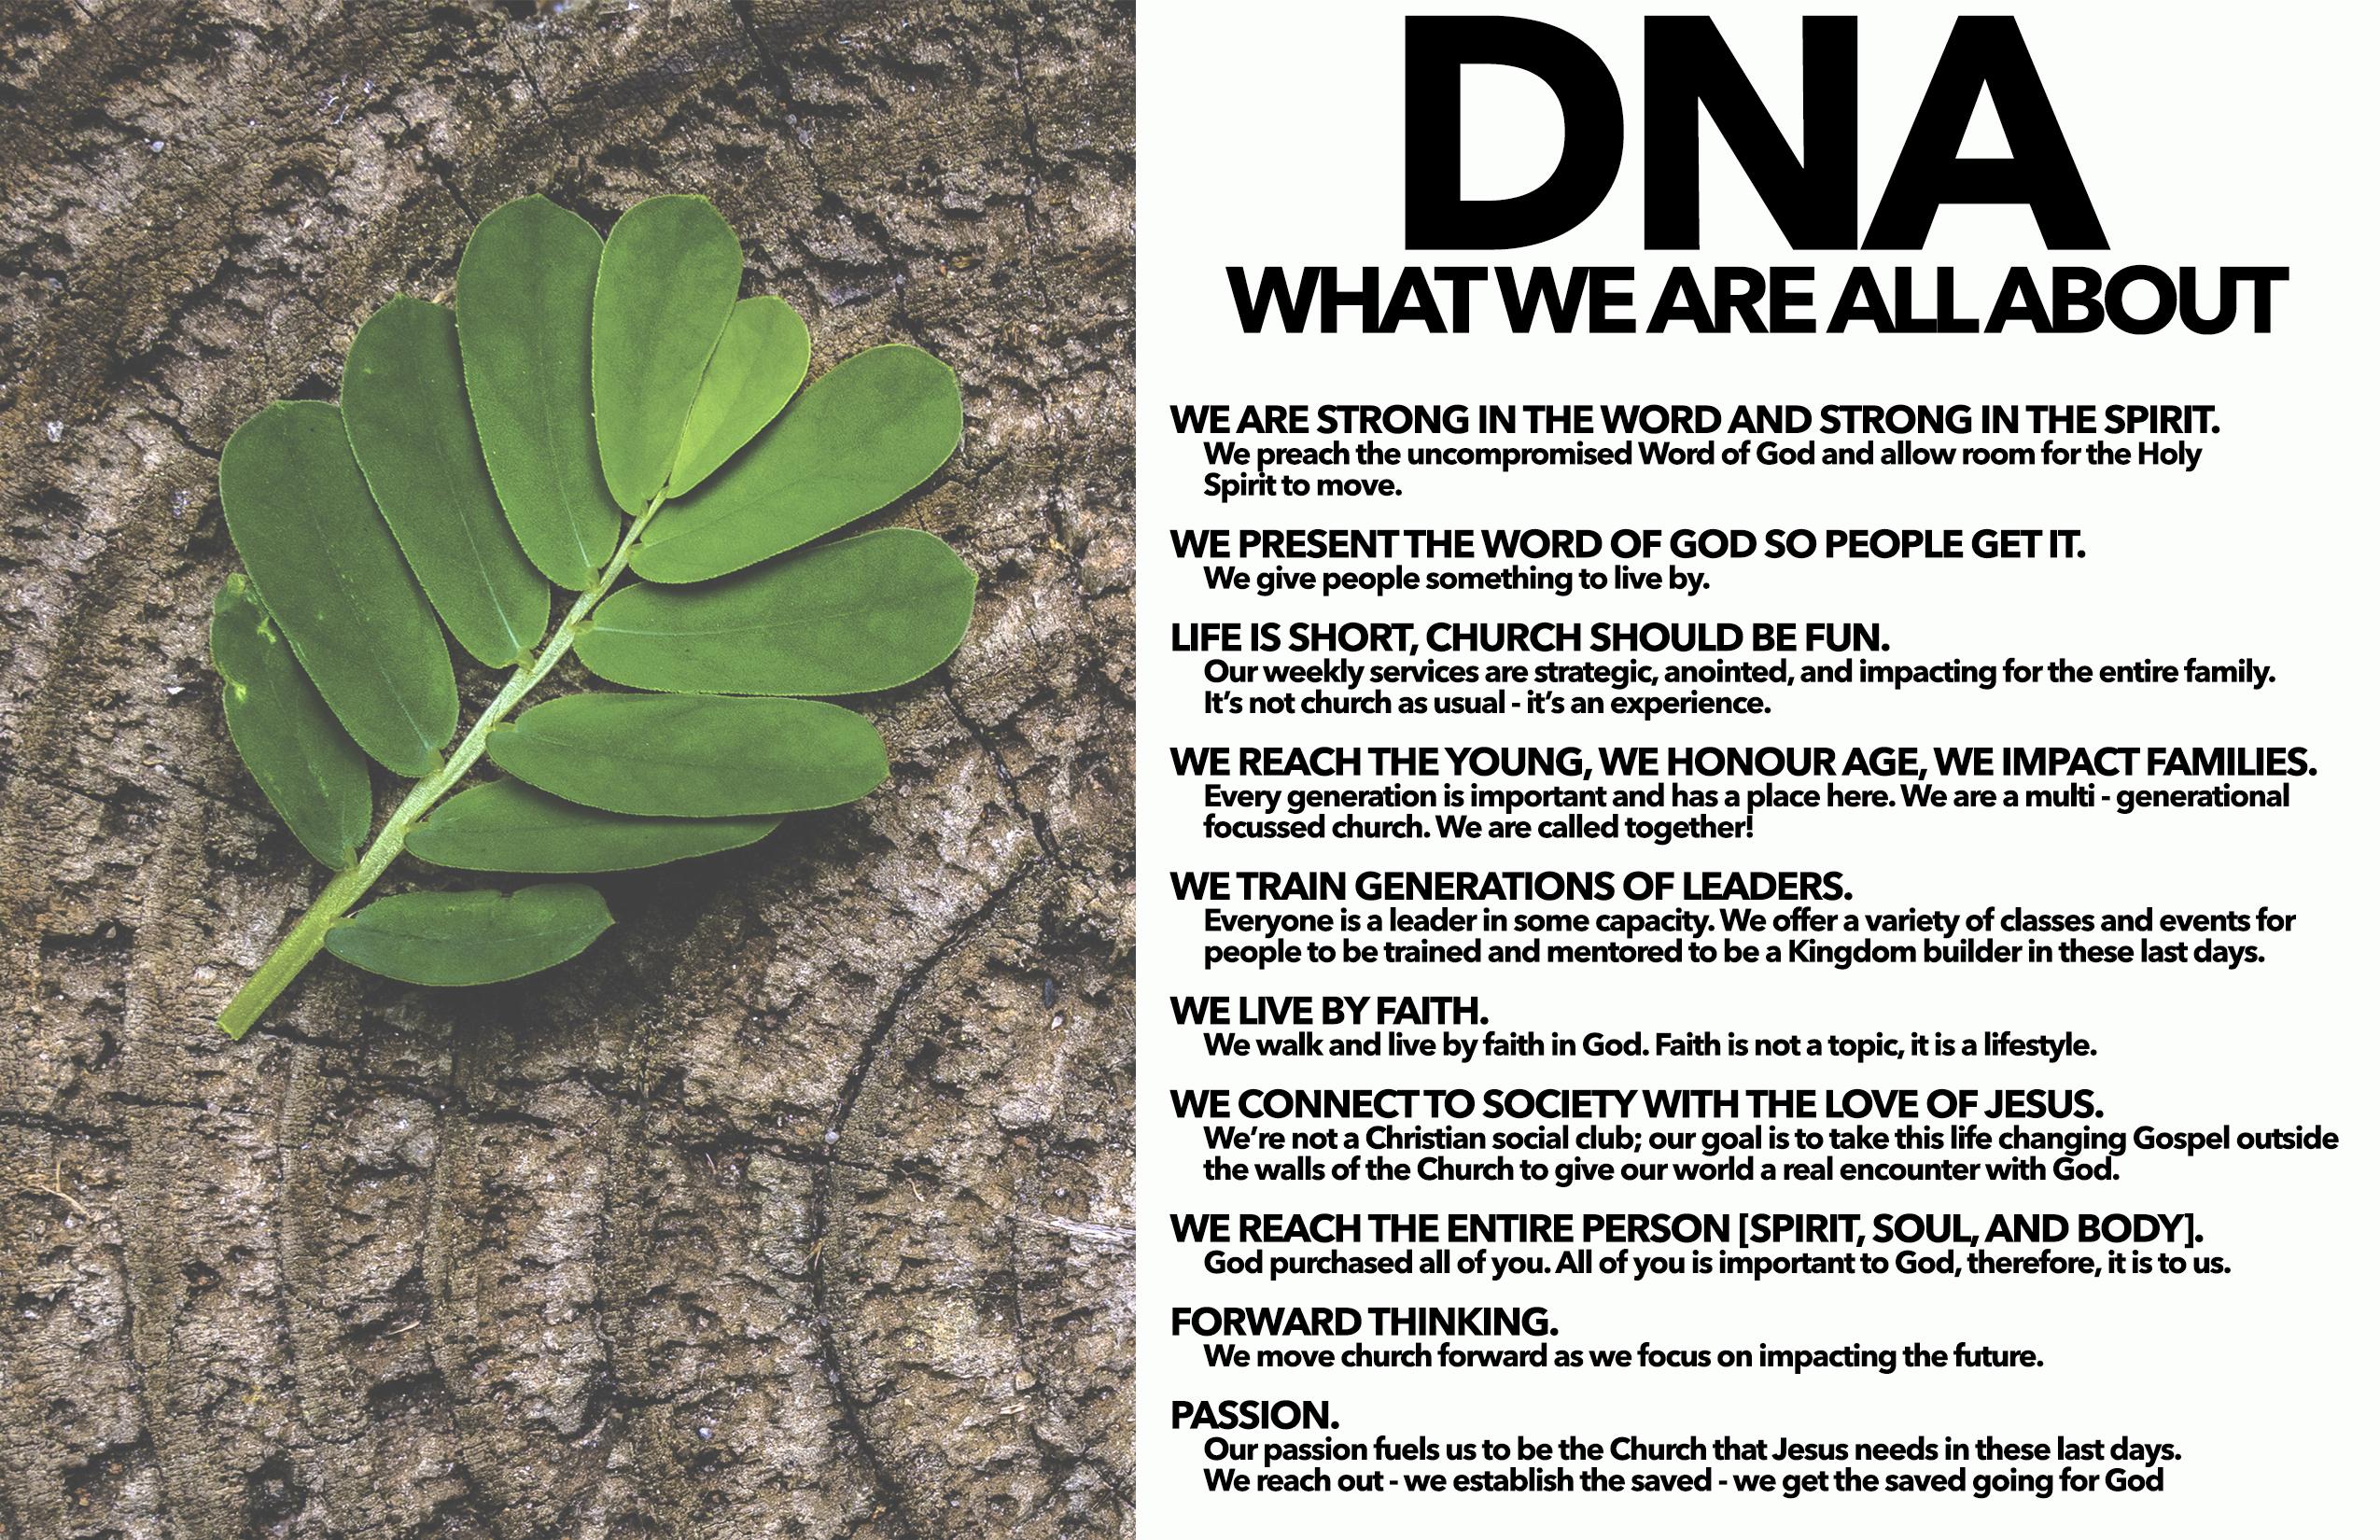 7. DNA